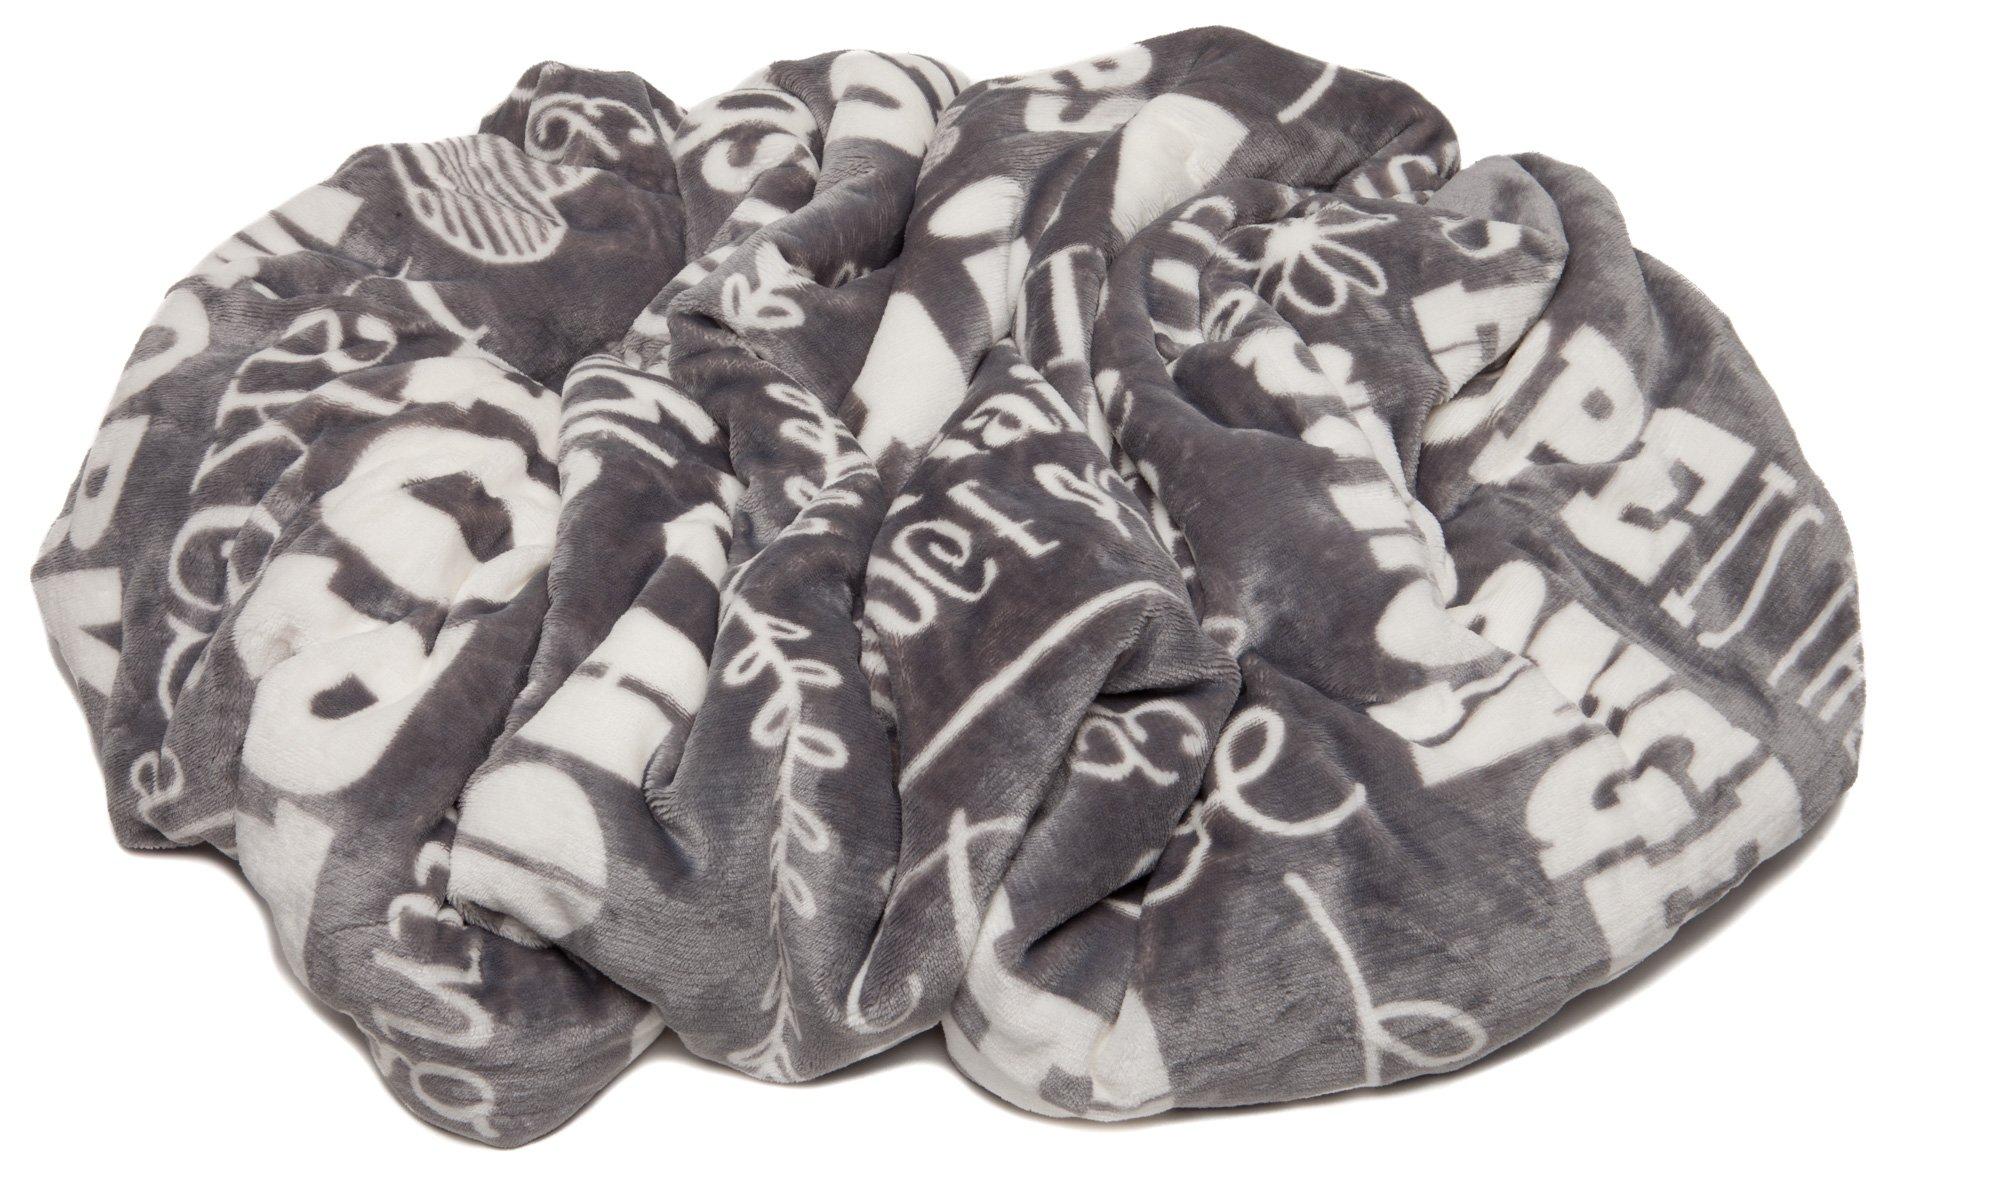 Chanasya Hope and Faith Inspirational Message Print Super Soft Ultra Plush Cozy Fleece Microfiber Sherpa Posivite Energy Comfort Caring Uplifting Gift Throw Blanket - for Women Men - Grey Blanket by Chanasya (Image #5)